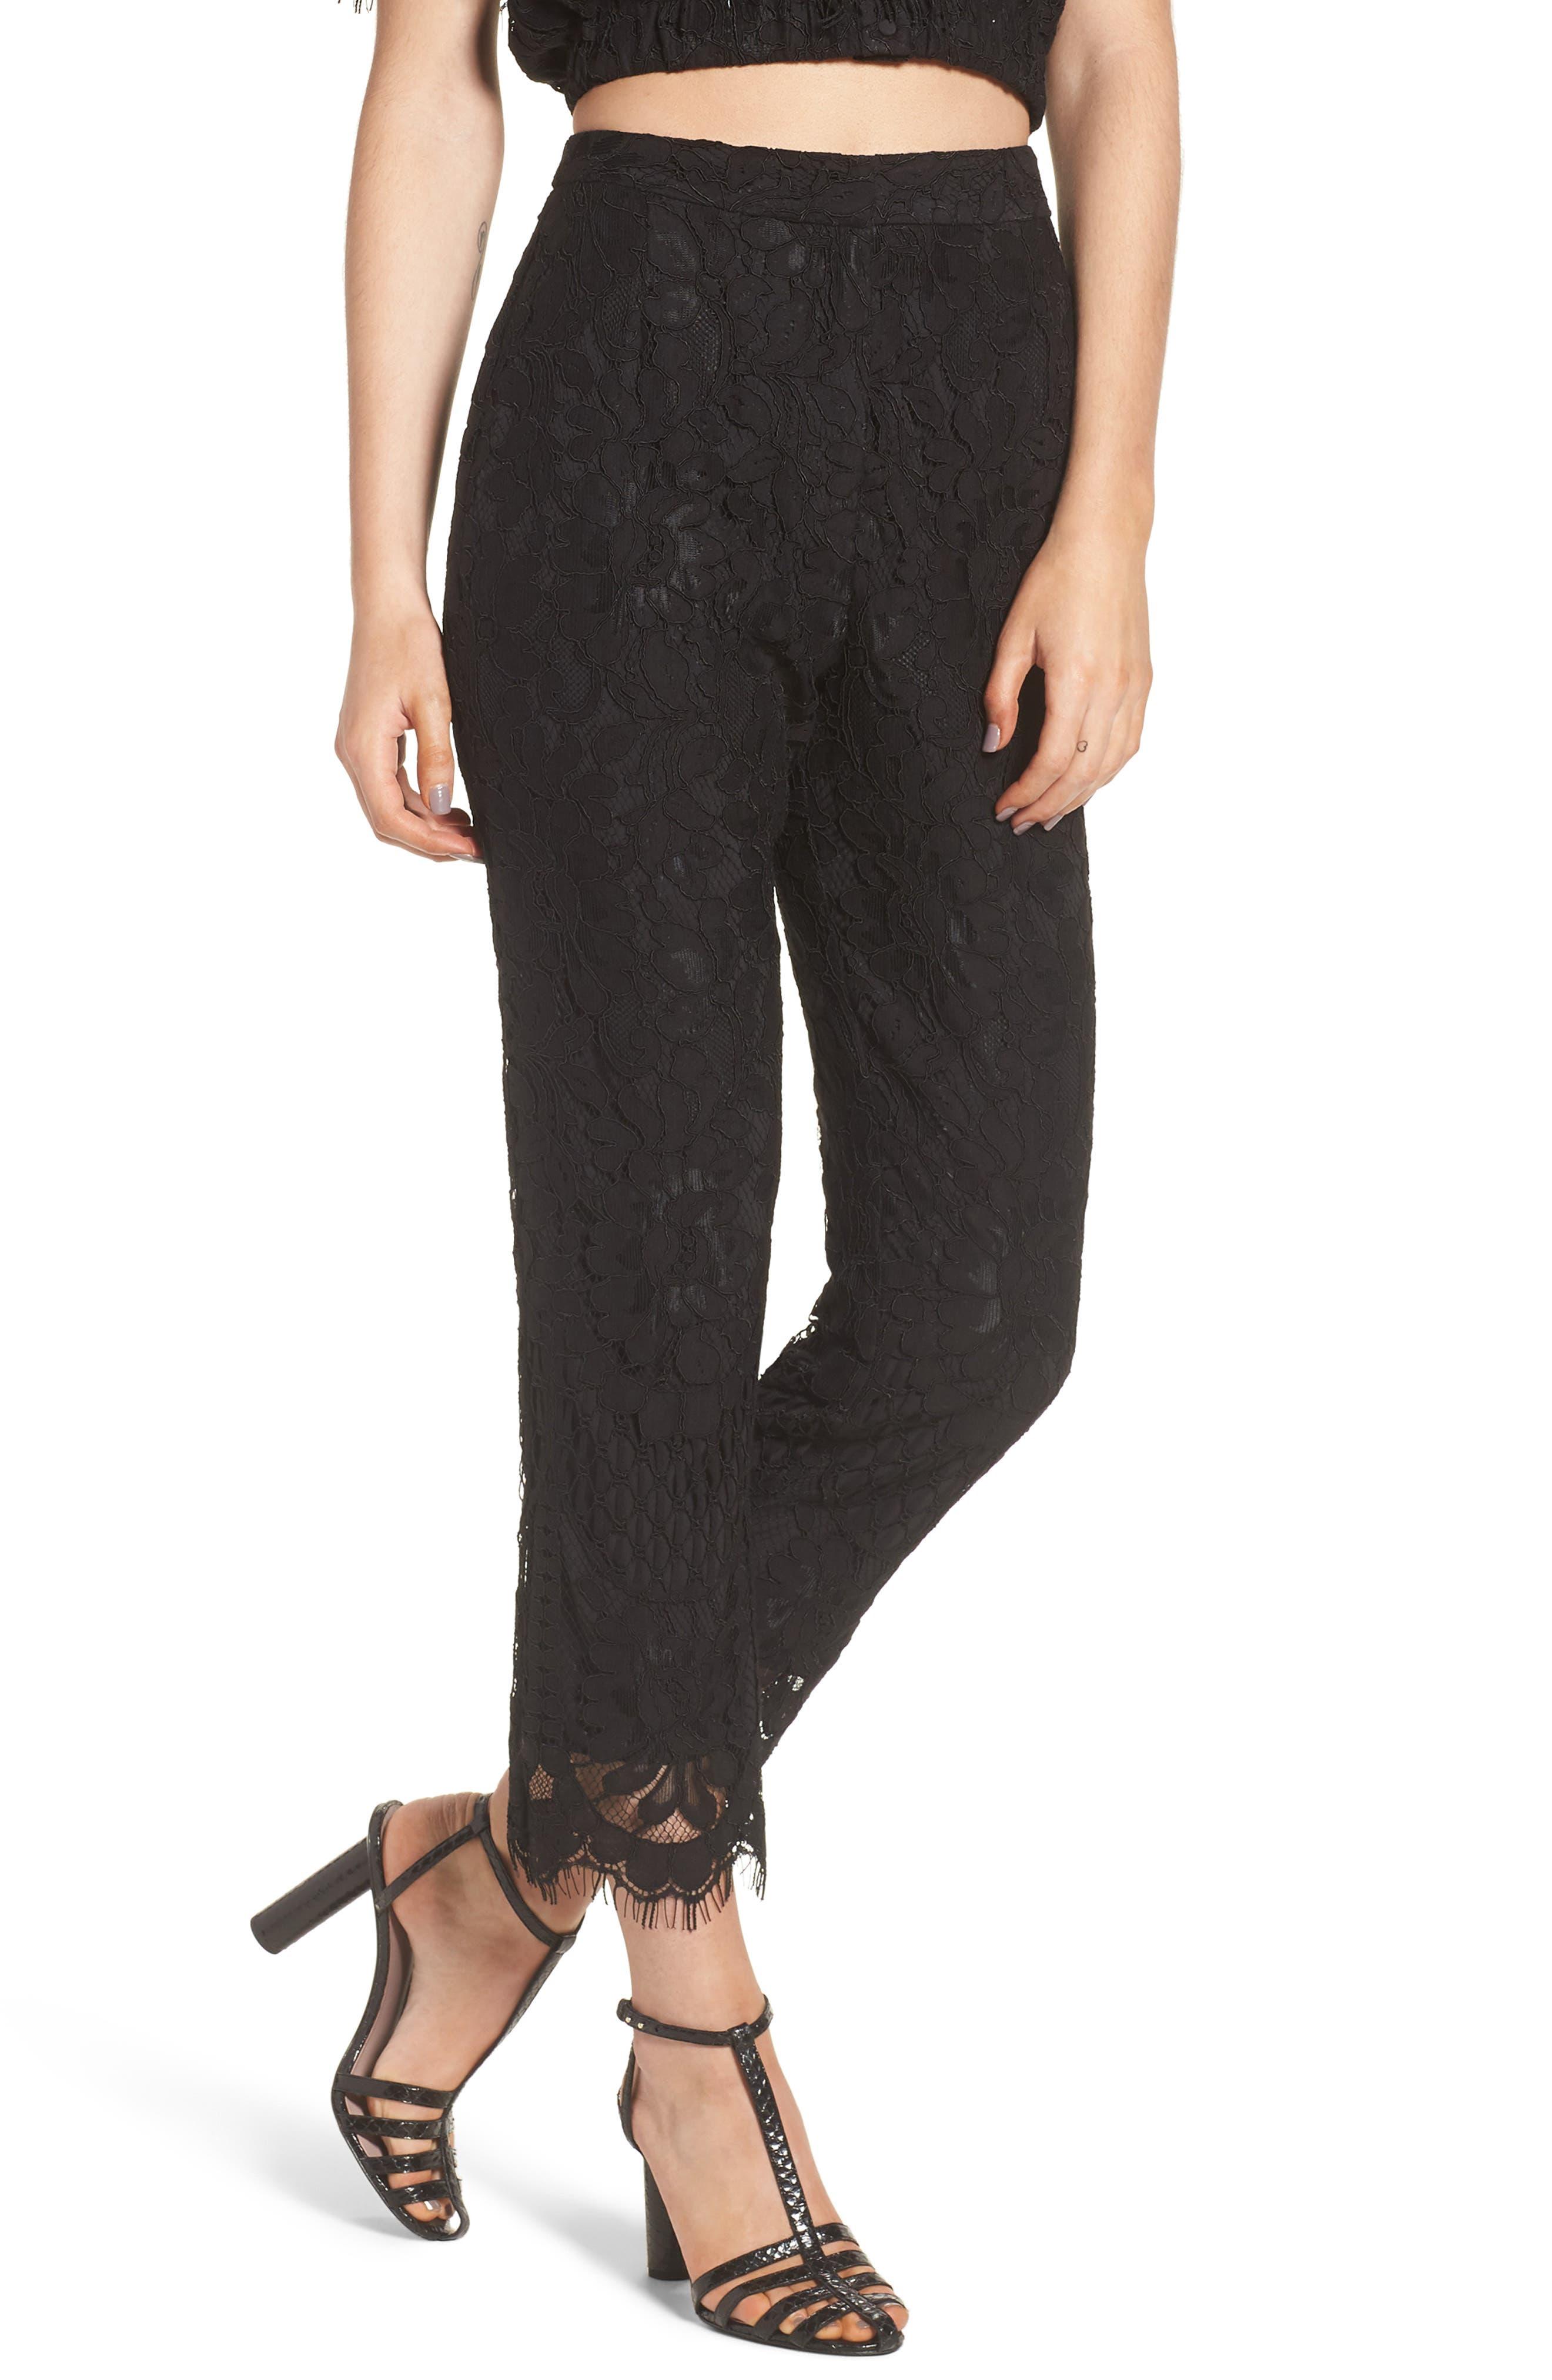 WAYF Rennes High Waist Crop Lace Pants